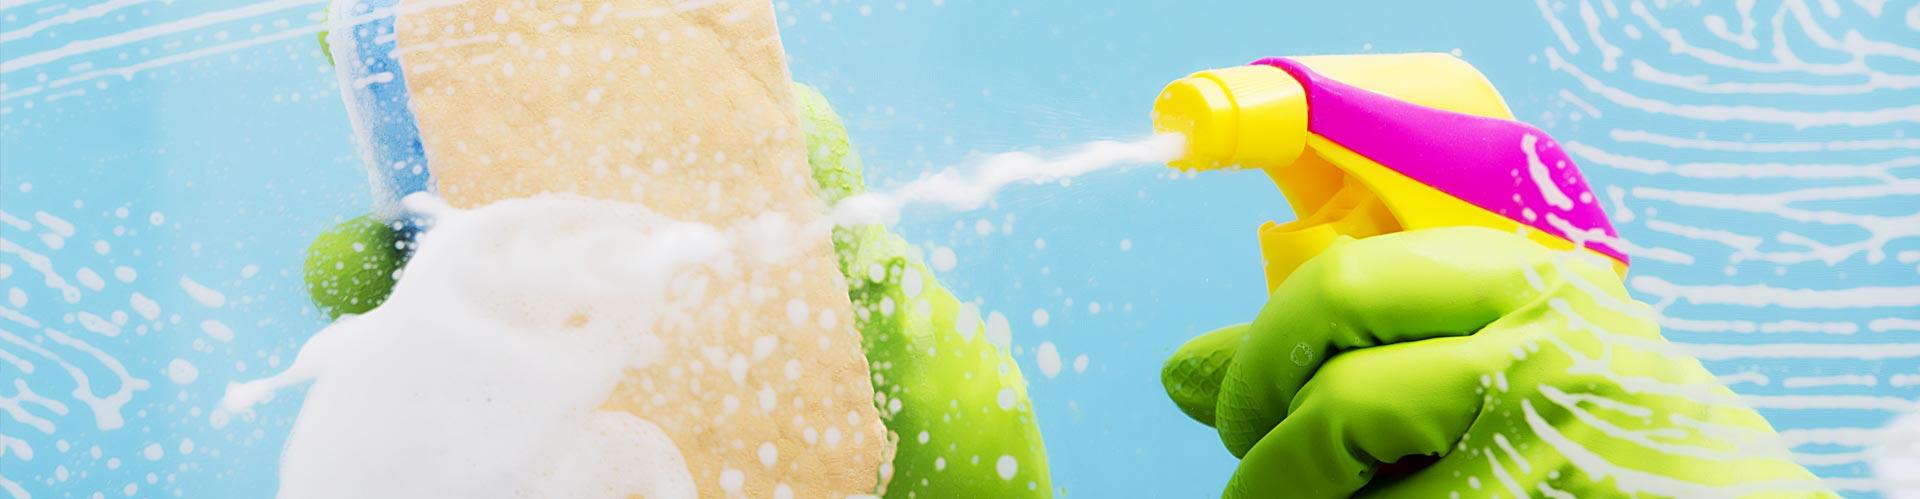 hps-spray